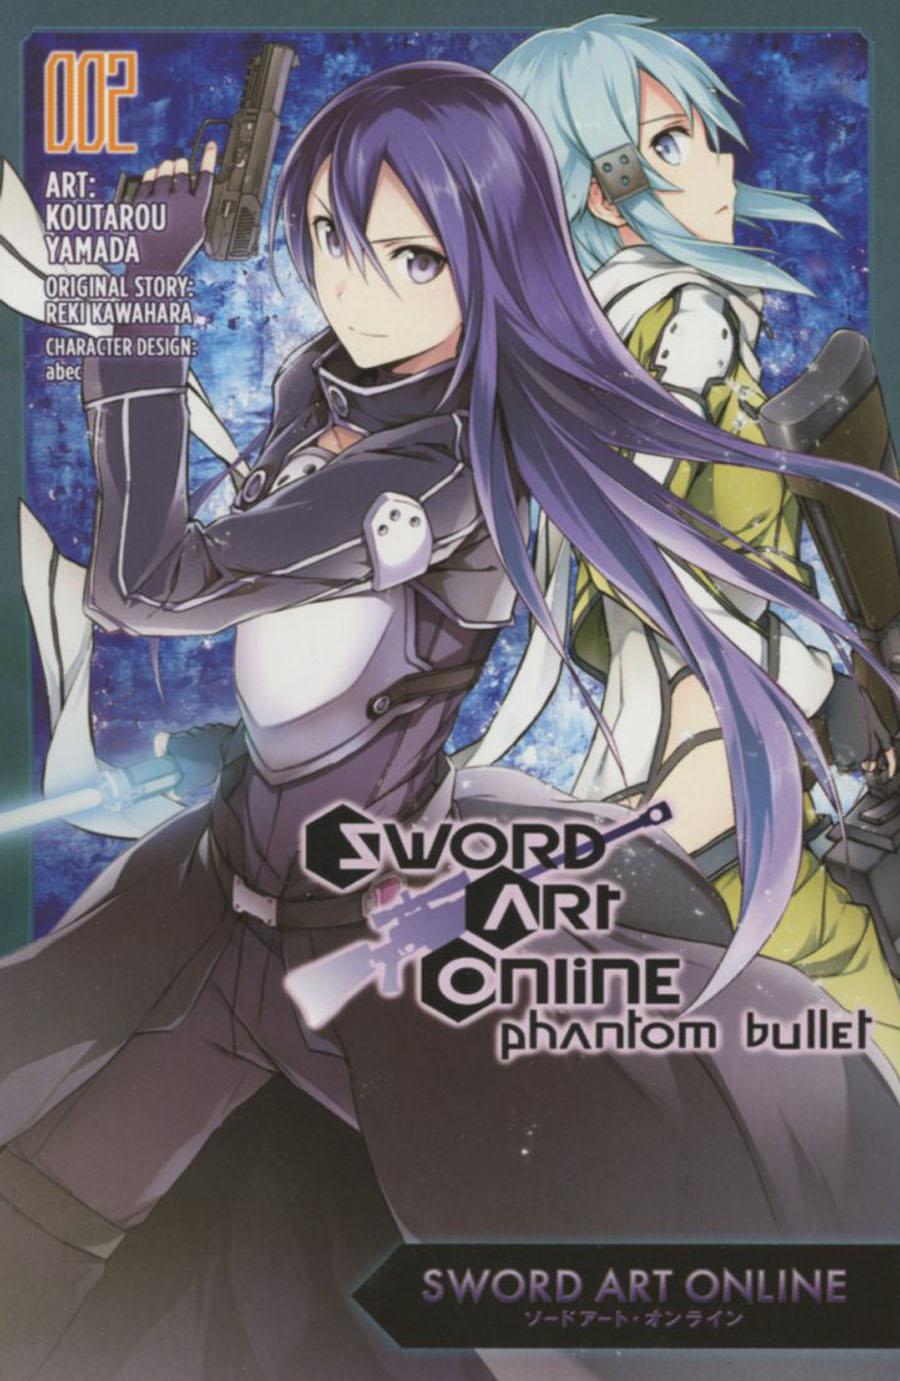 Sword Art Online Phantom Bullet Vol 2 GN